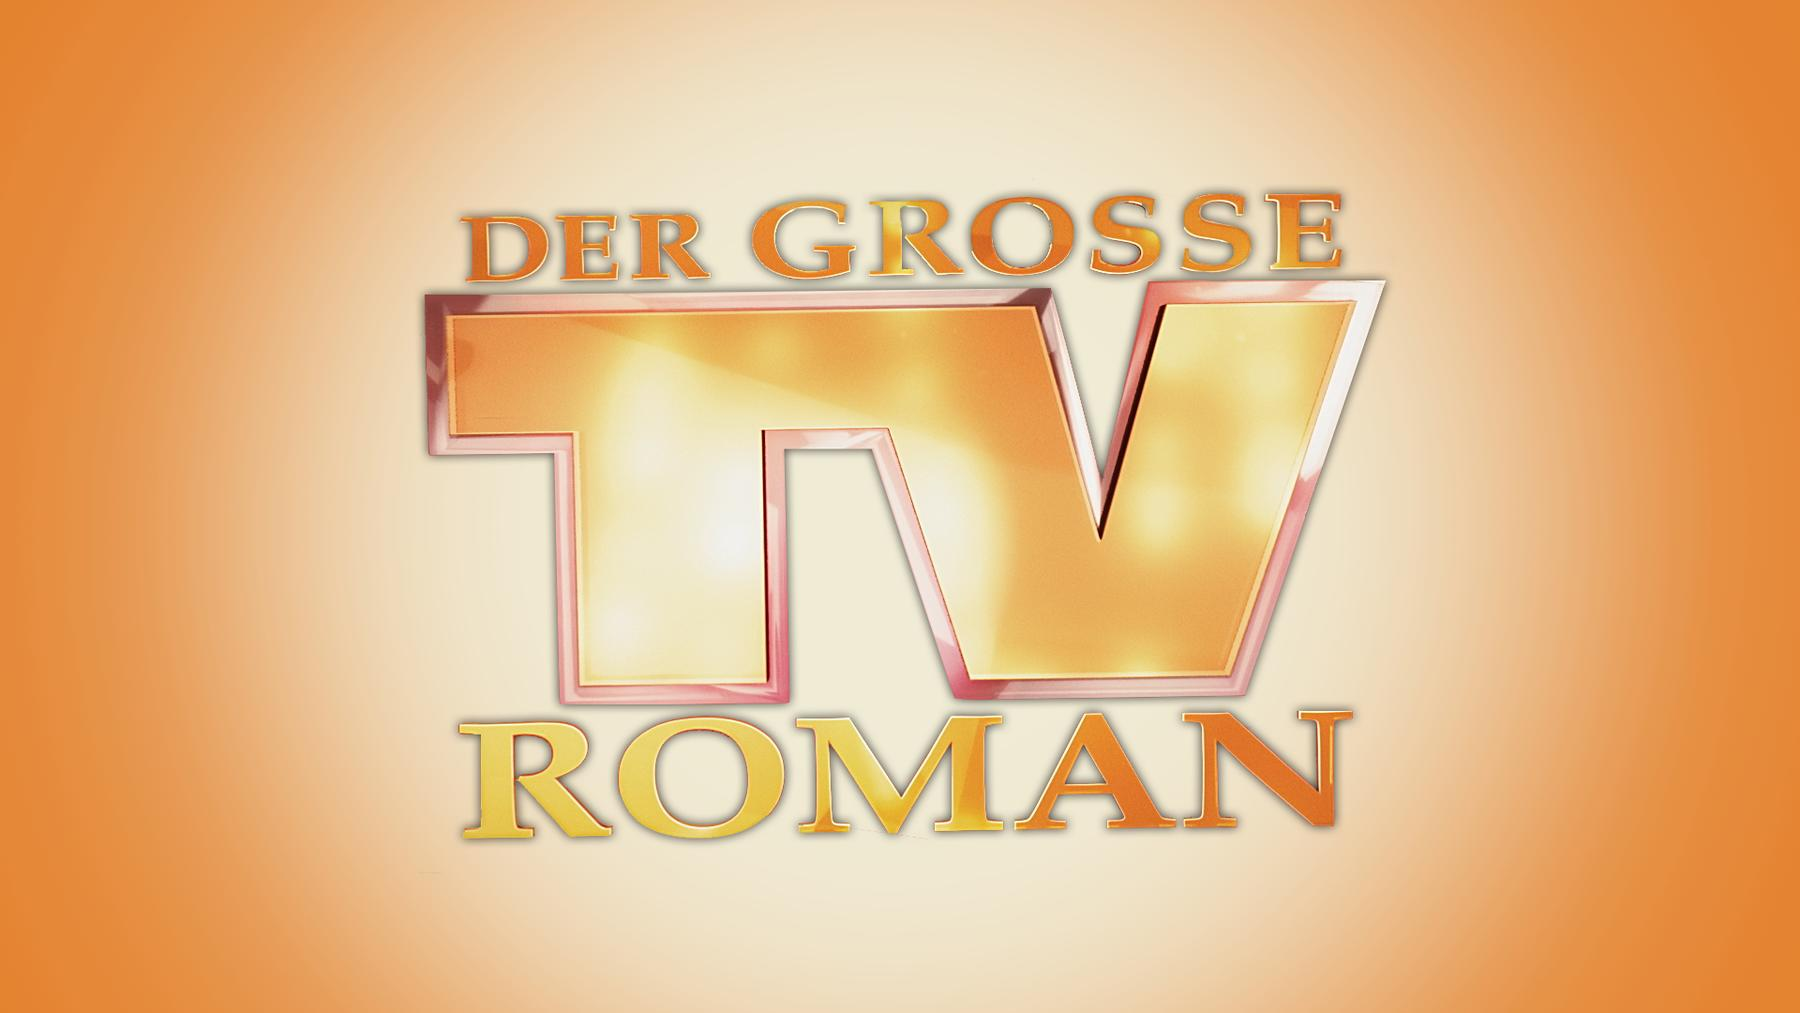 Der große TV-Roman